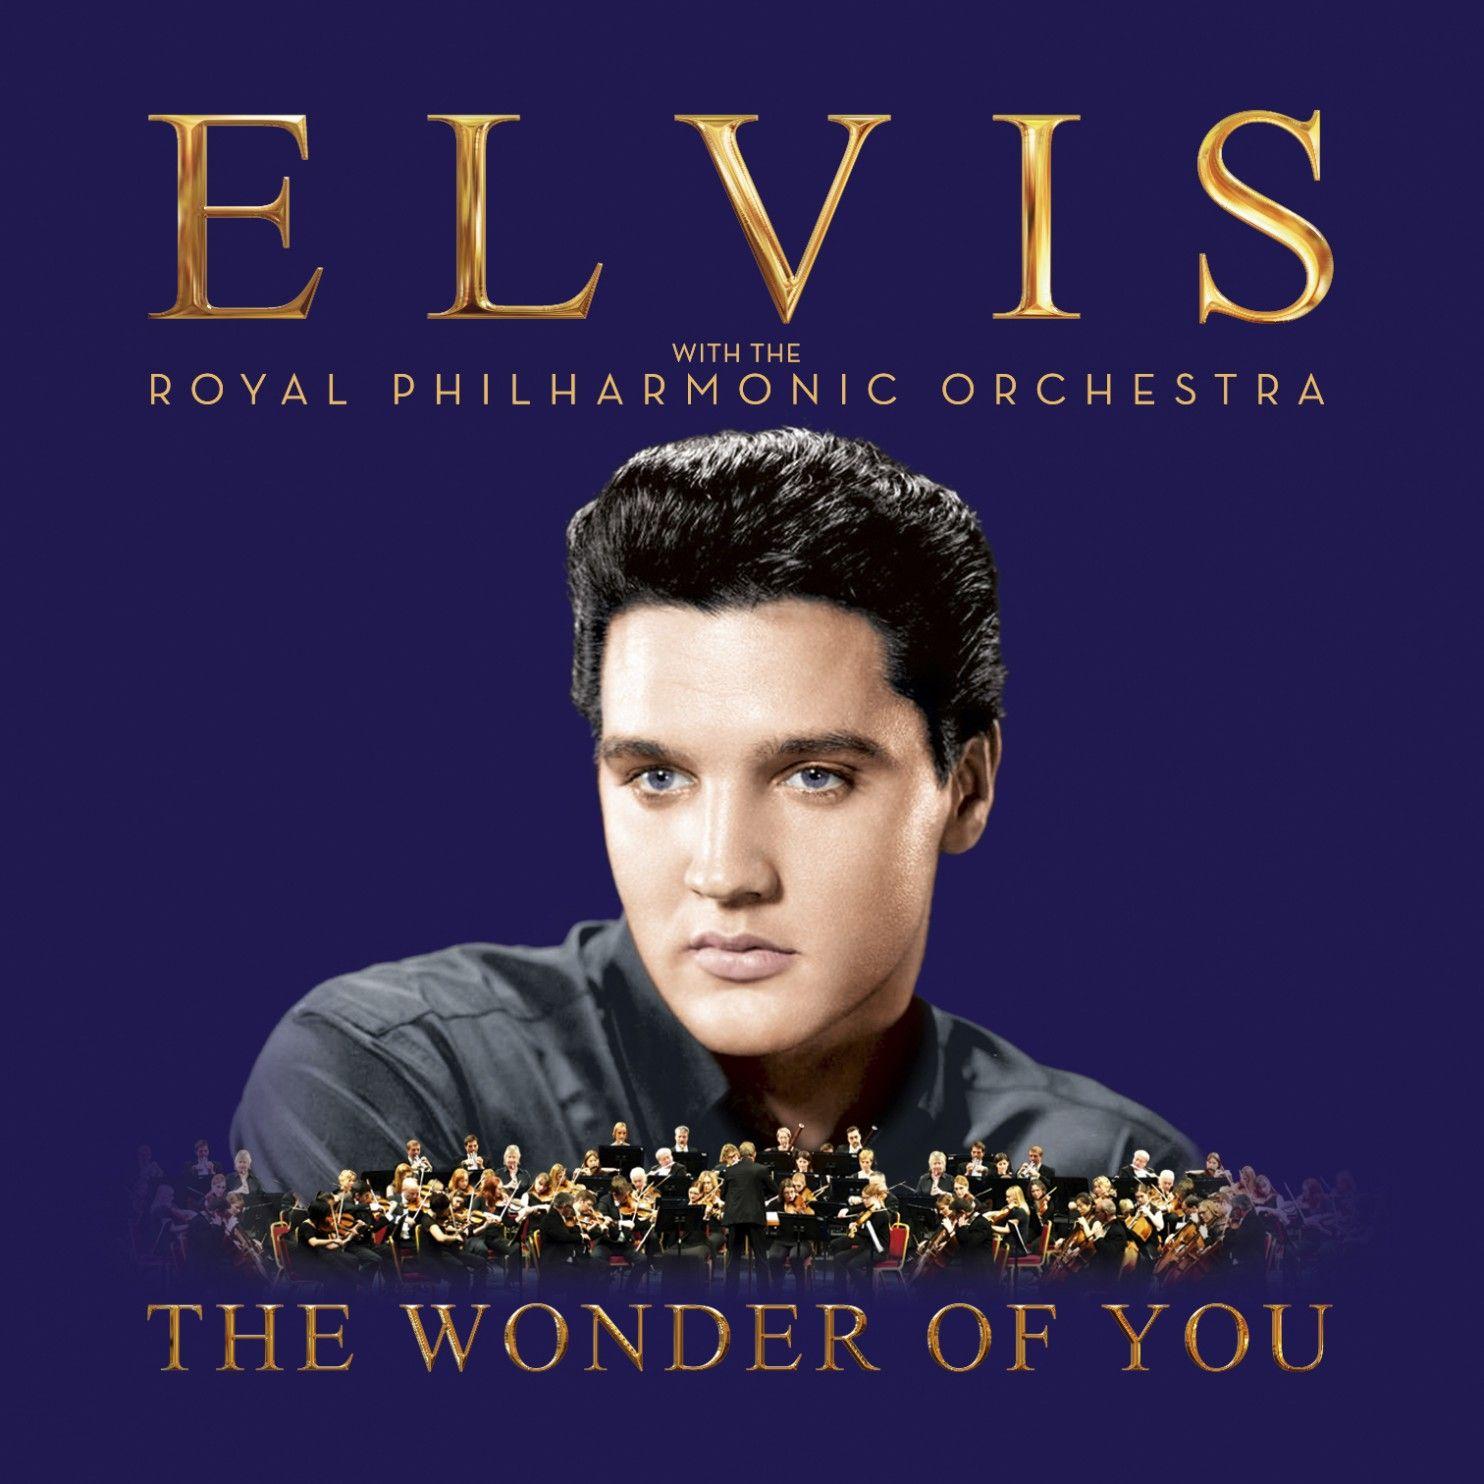 Pin by Public Library of Cincinnati a on Music Elvis